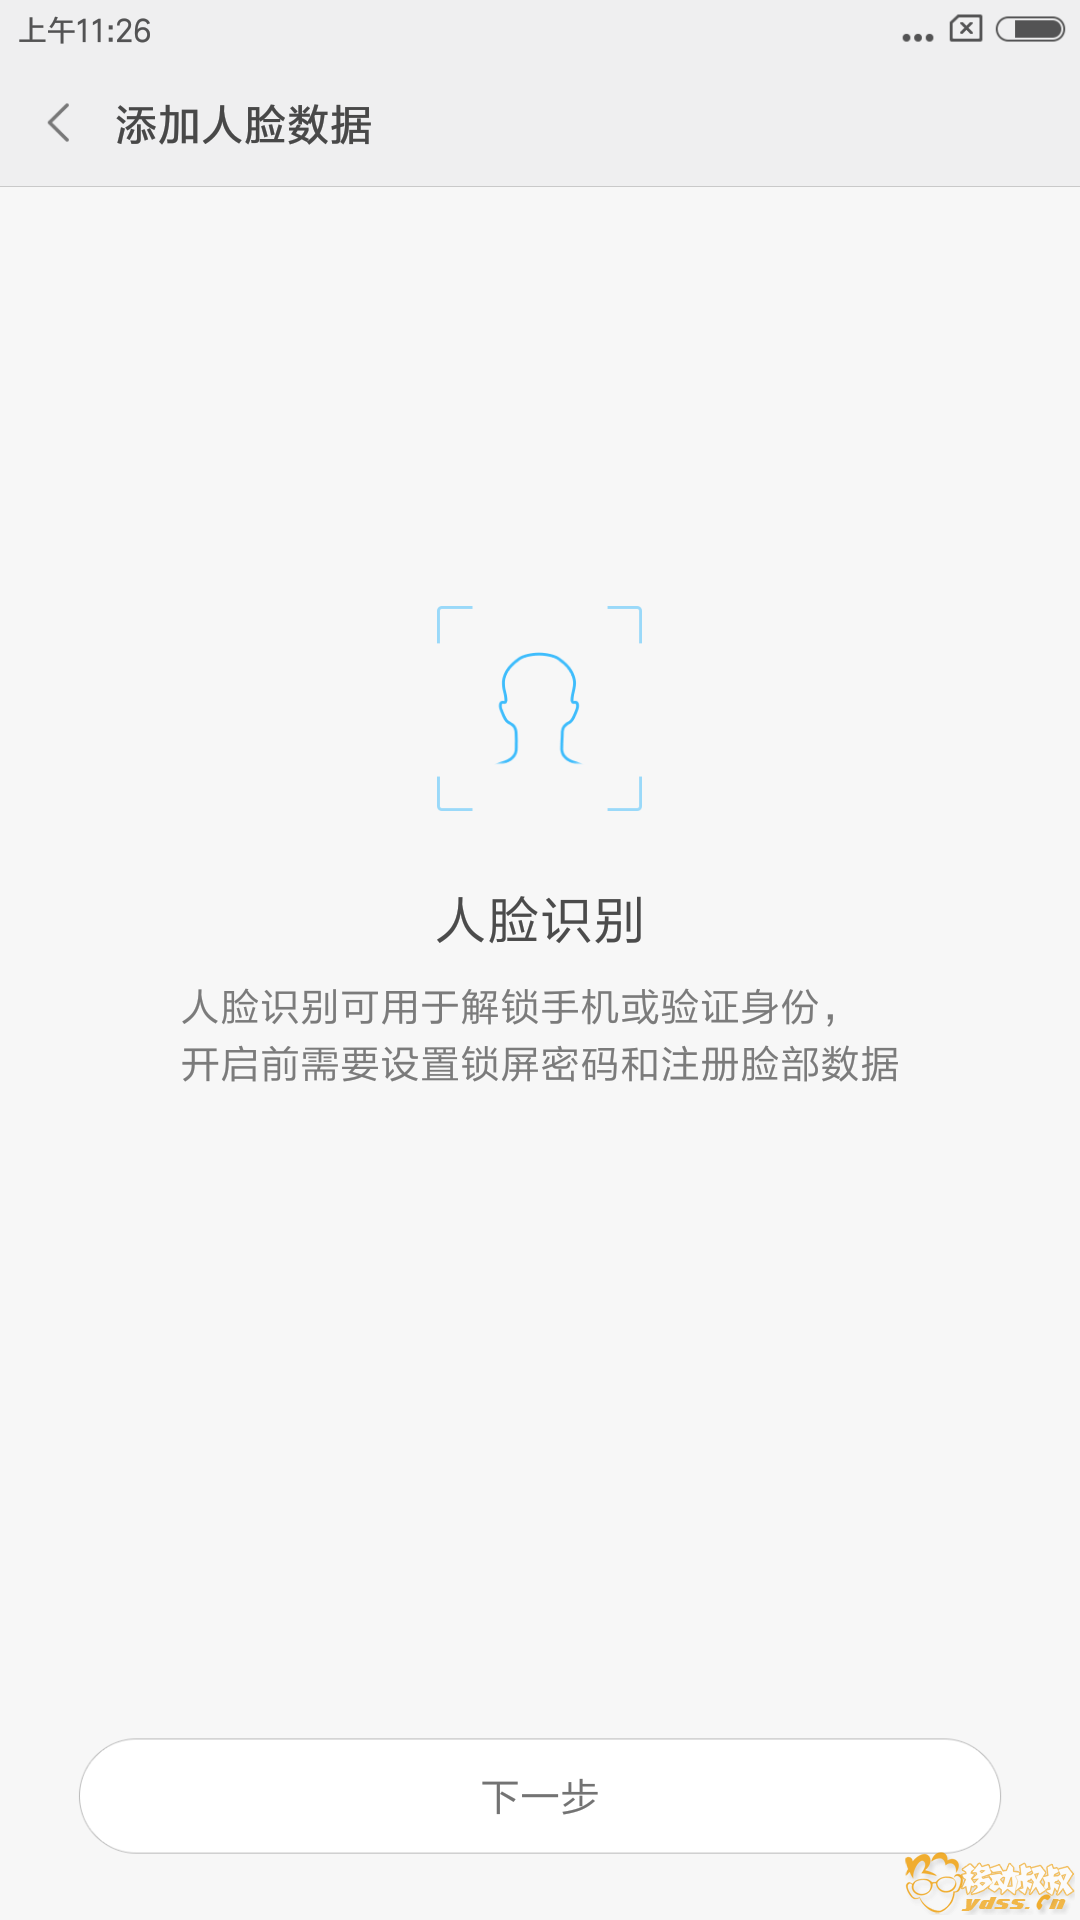 Screenshot_2018-01-11-11-26-30-570_com.android.keyguard.png